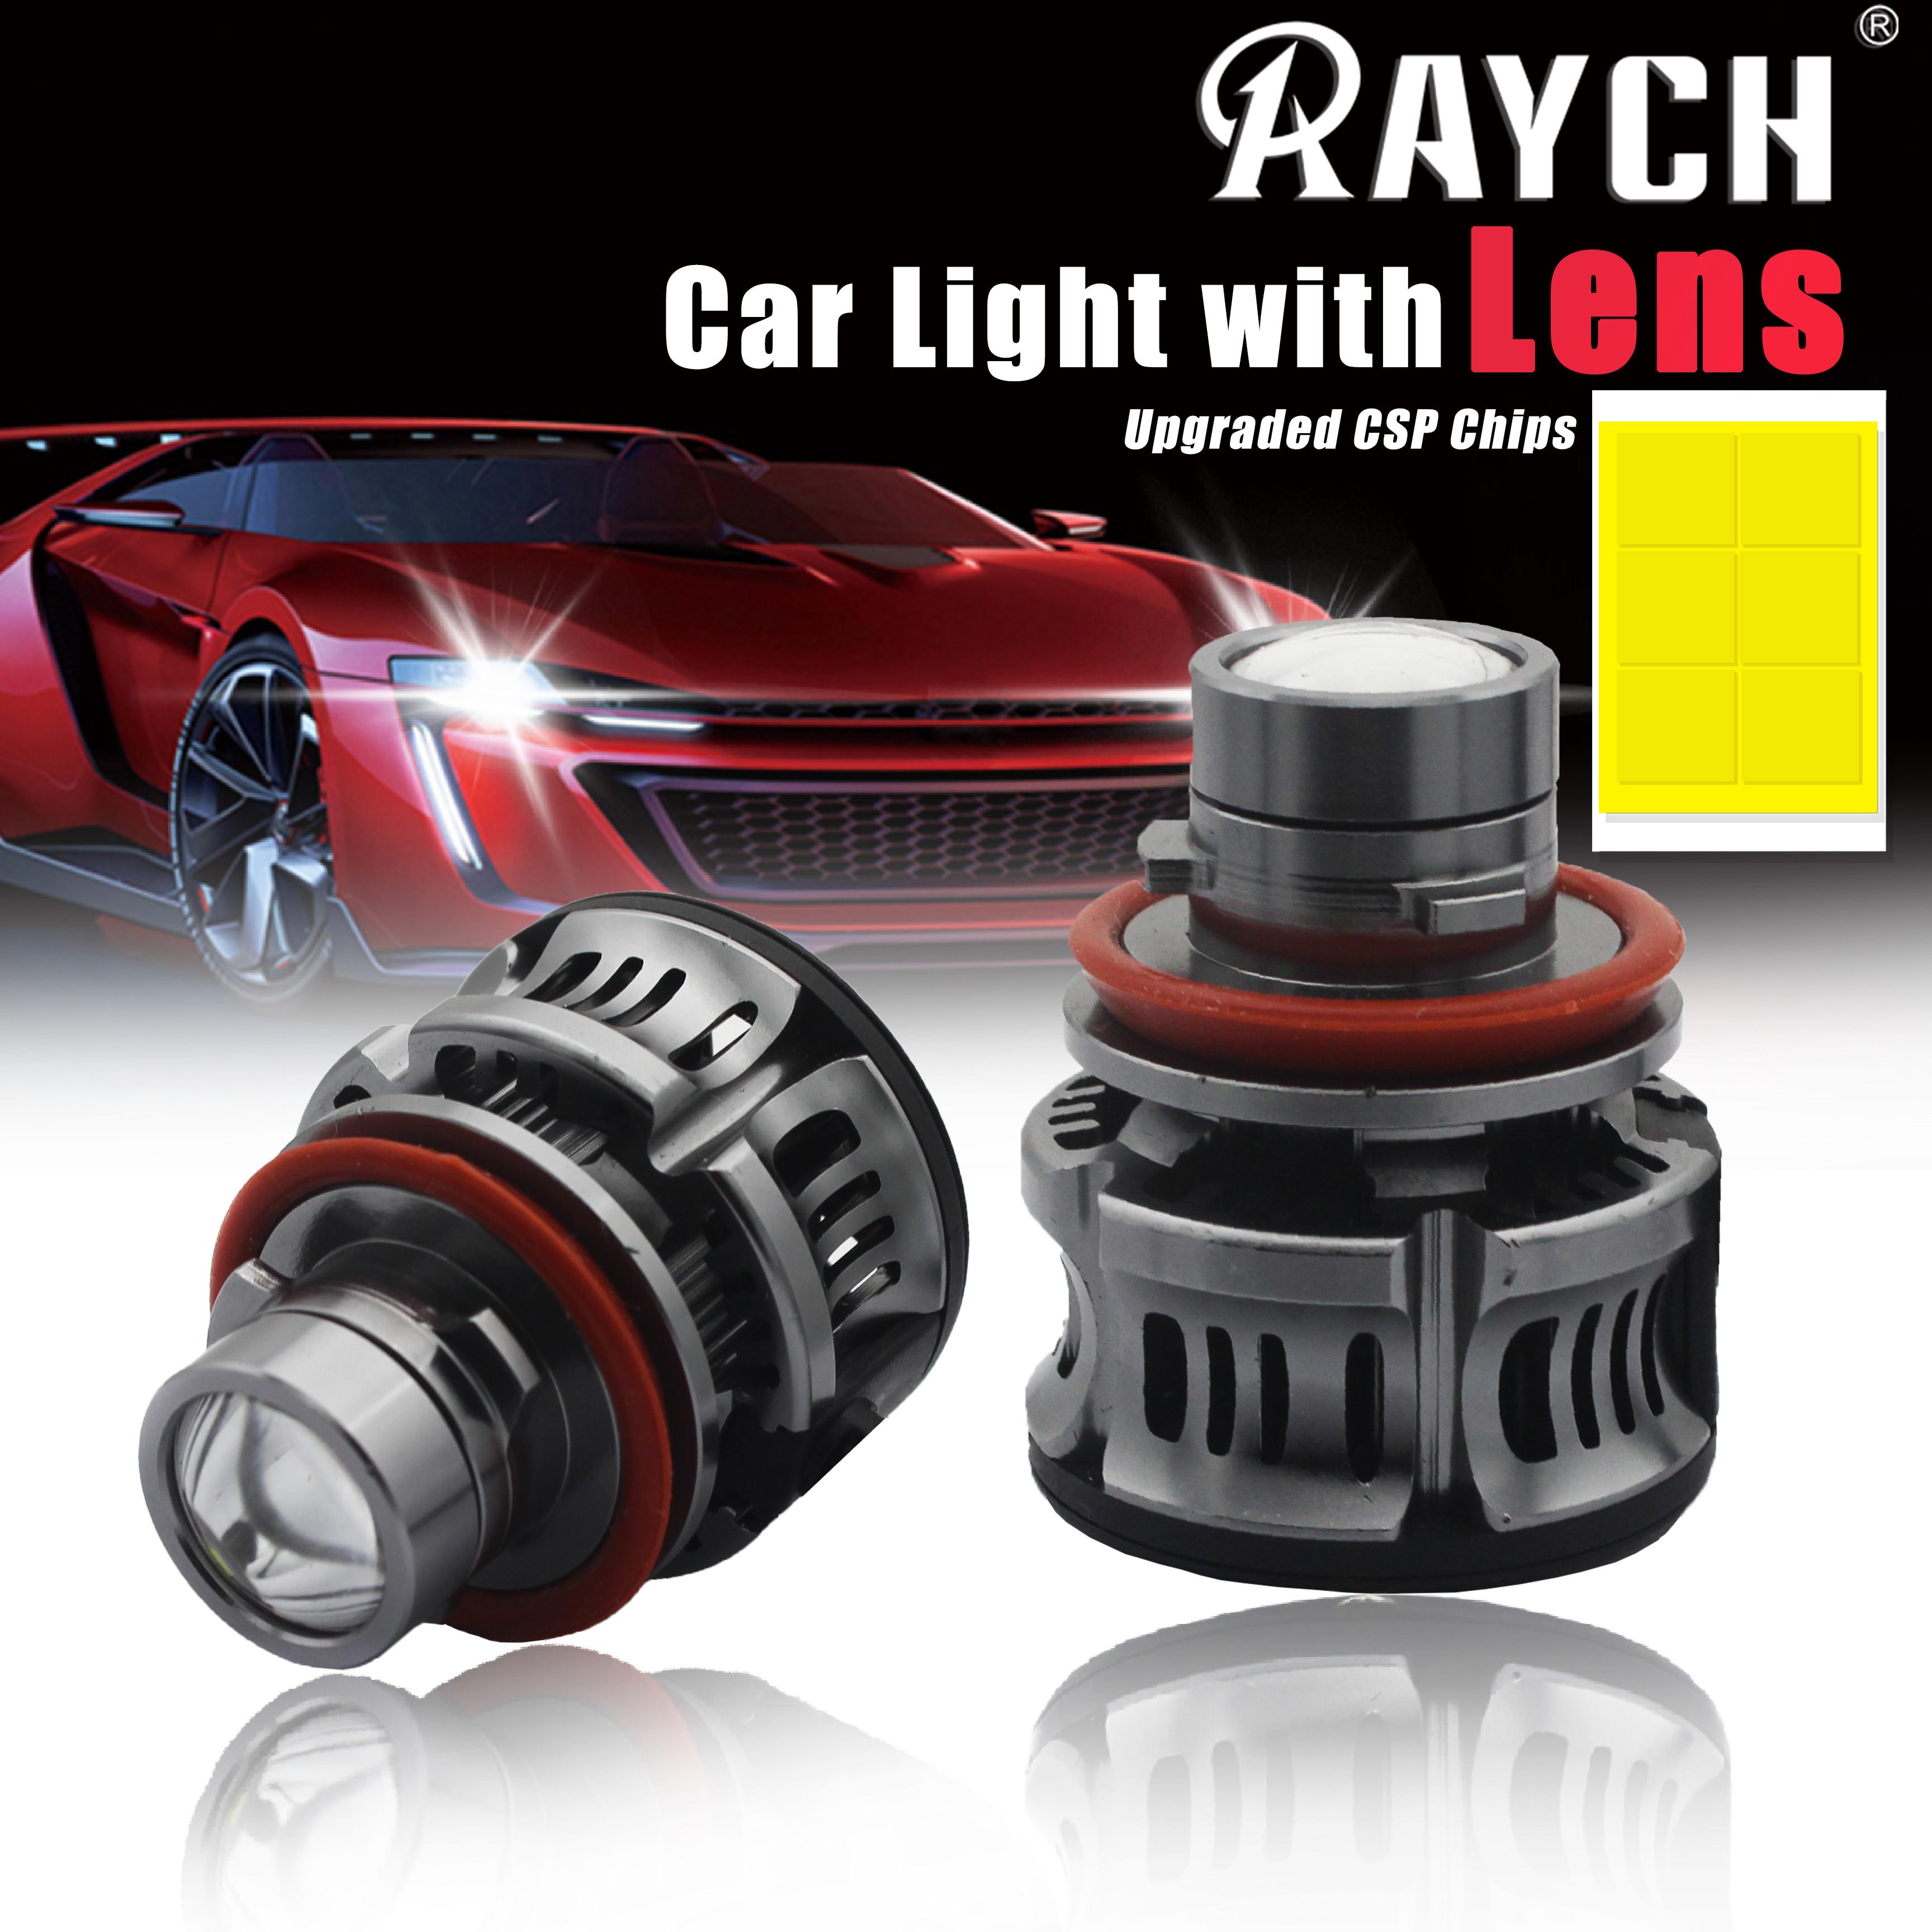 LED H7 السيارات الضباب كشاف ضوئي عدسة LED مصباح ل سيارة H11 H8 H9 9005 HB3 6000k 9006 HB4 45W 2400Lm زاوية عيون الضباب مصابيح كهربائية